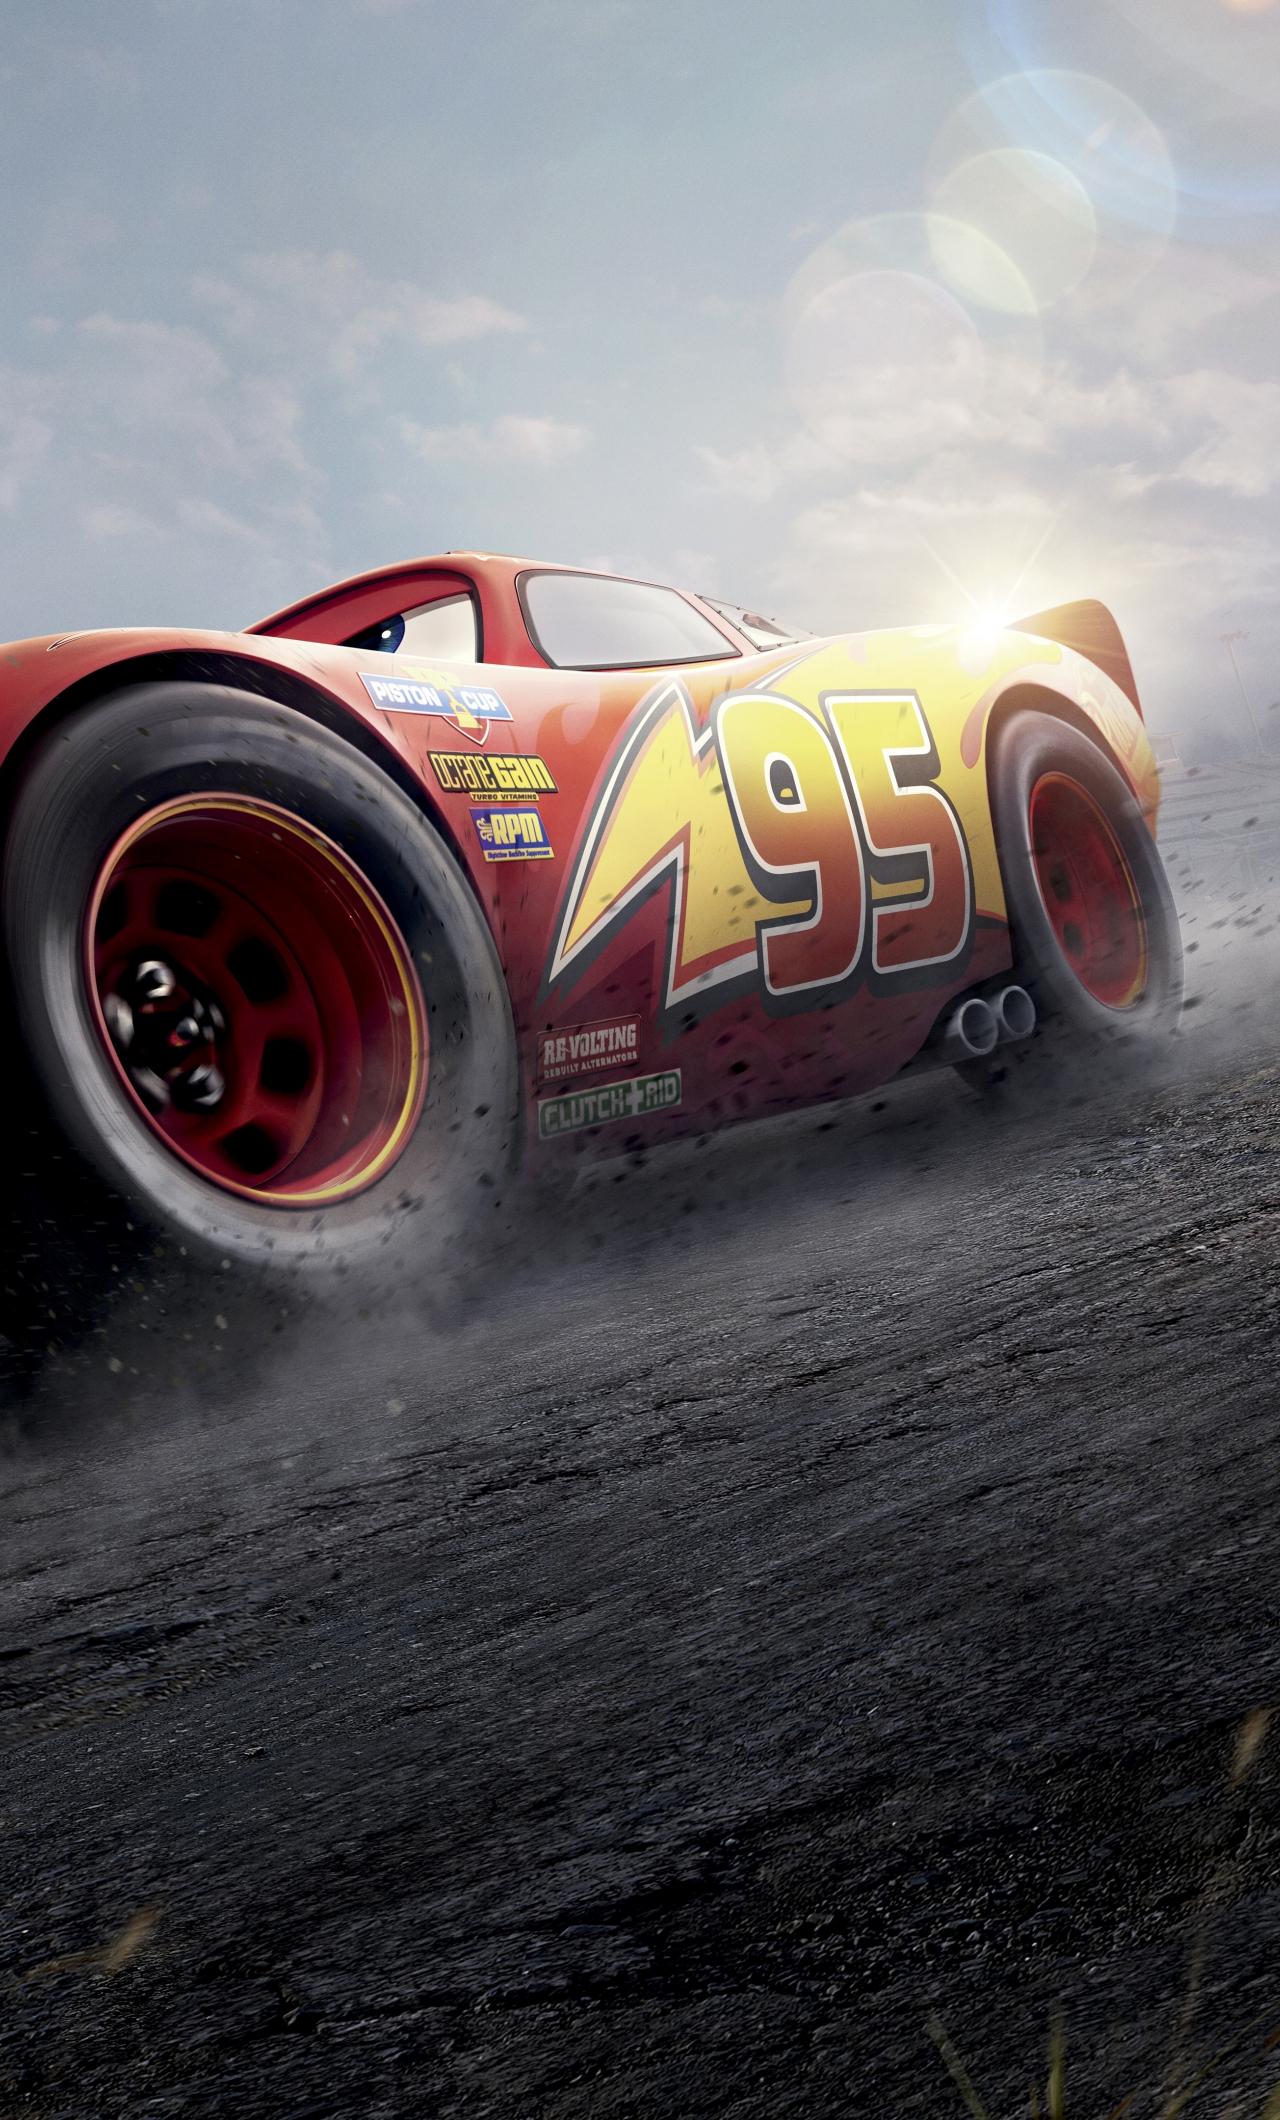 Download 1280x2120 Wallpaper Cars 3 Red Lightning Mcqueen